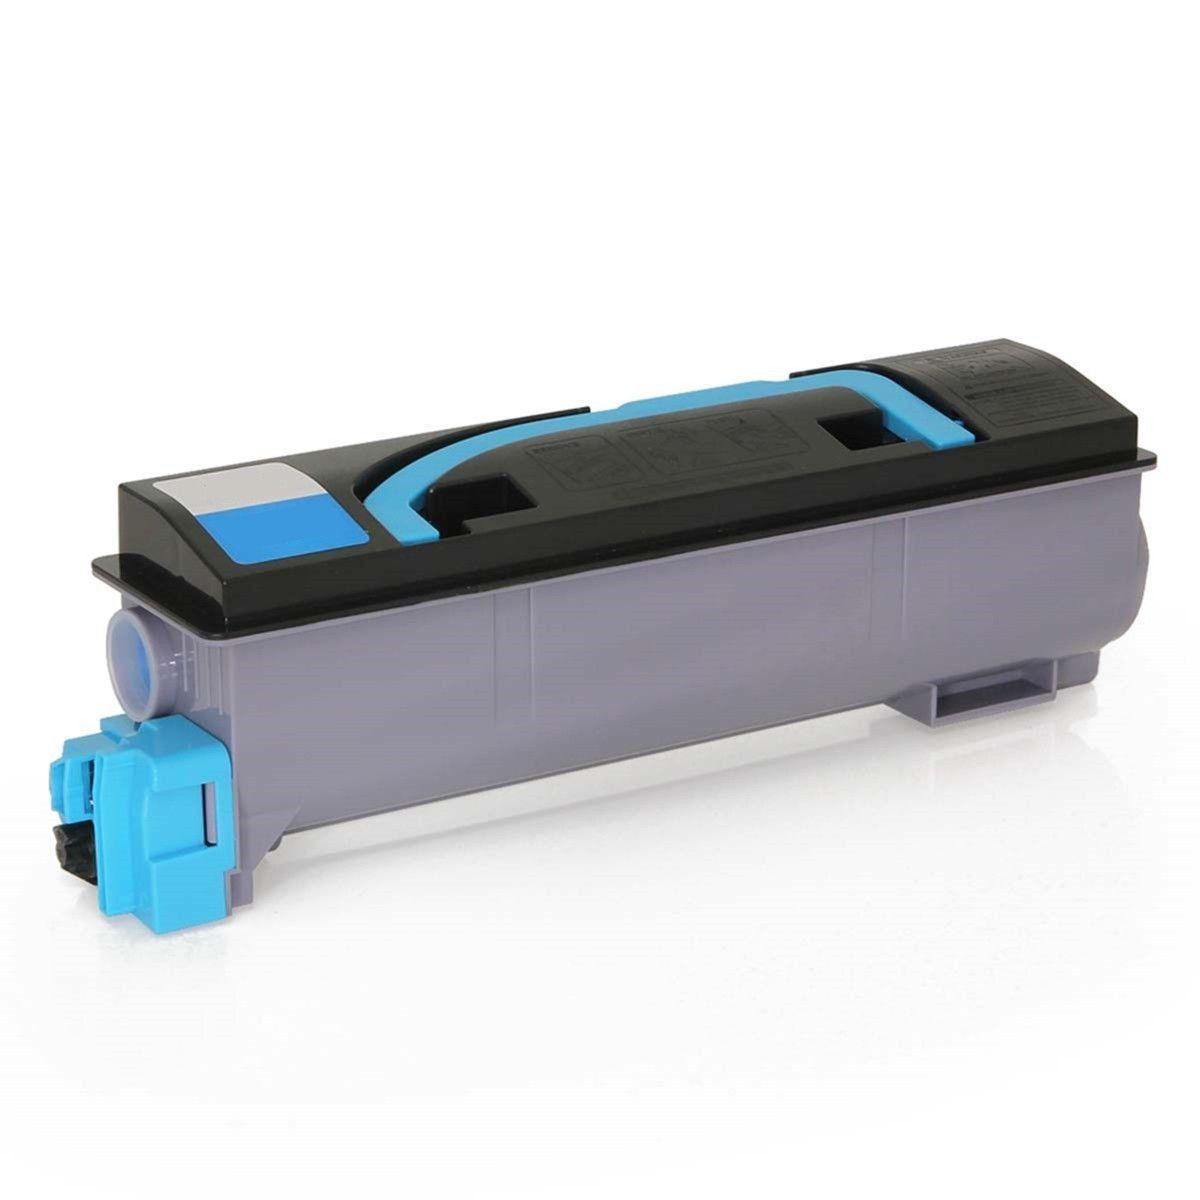 Compatível: Toner TK-562C TK562 para Kyocera FSC5300 FSC5350 FSC5300dn FSC5350dn 5300 5350 5300dn / Ciano / 10.000